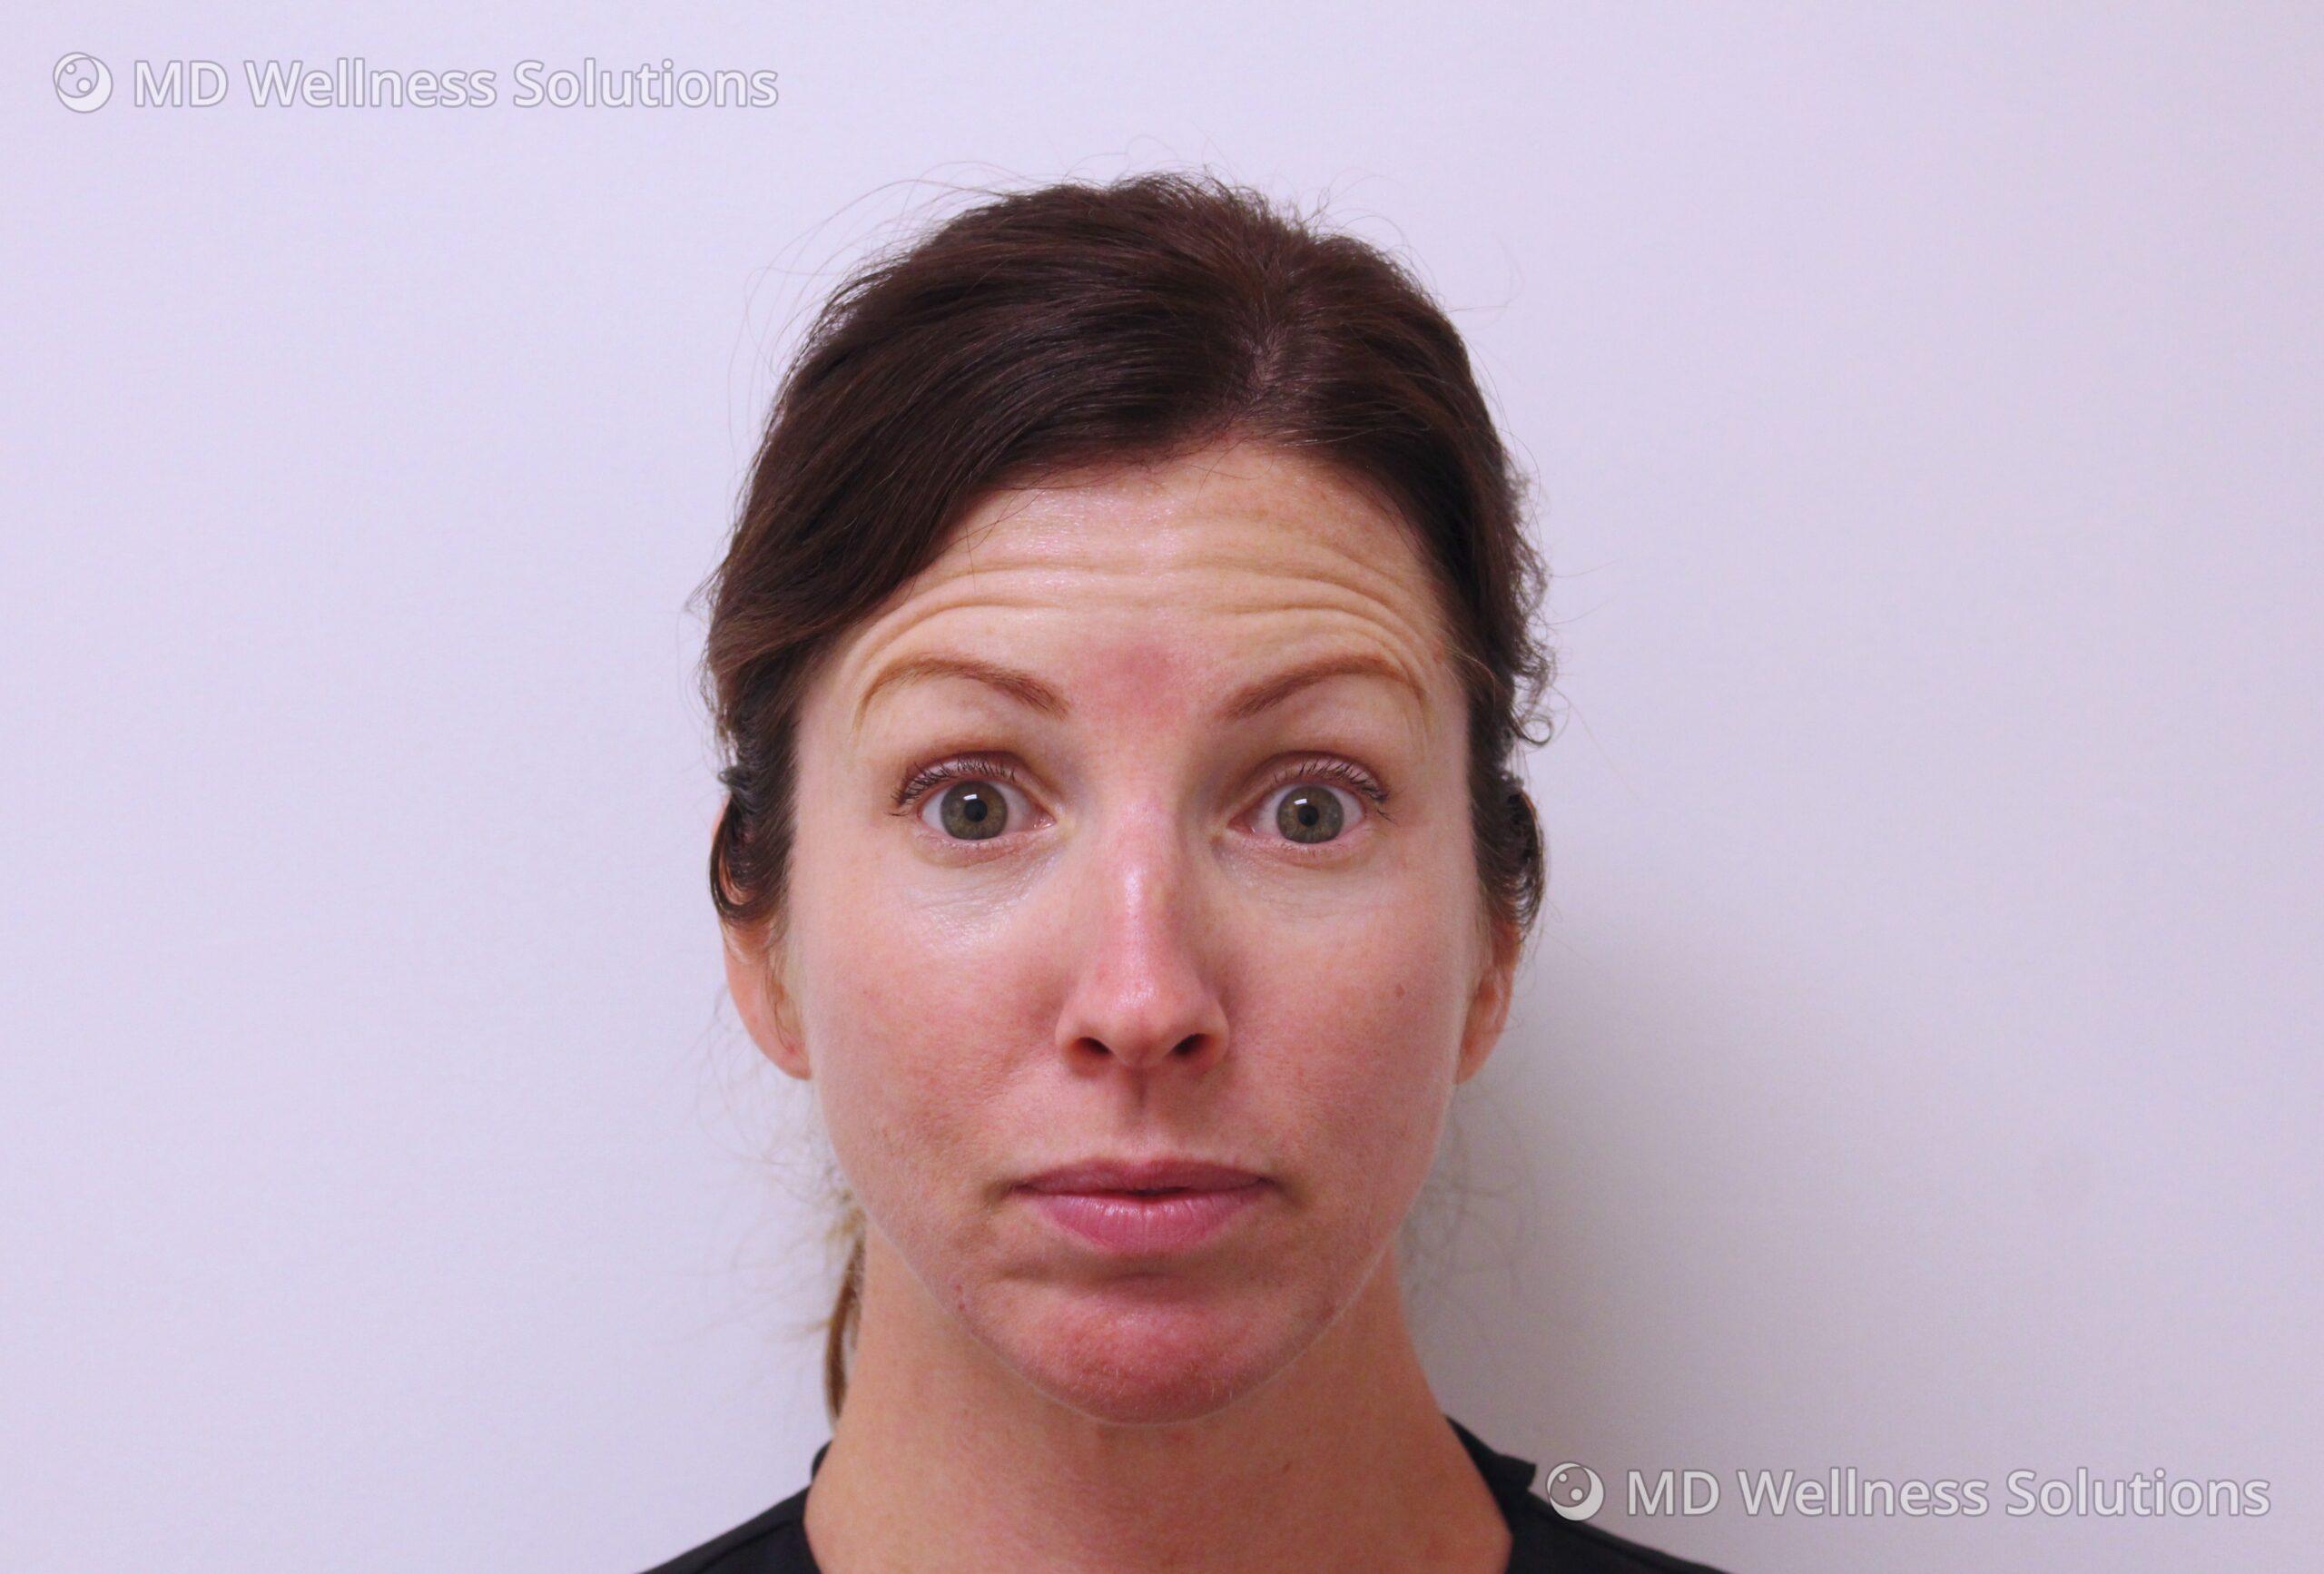 35-44 year old woman before neurotoxin treatment